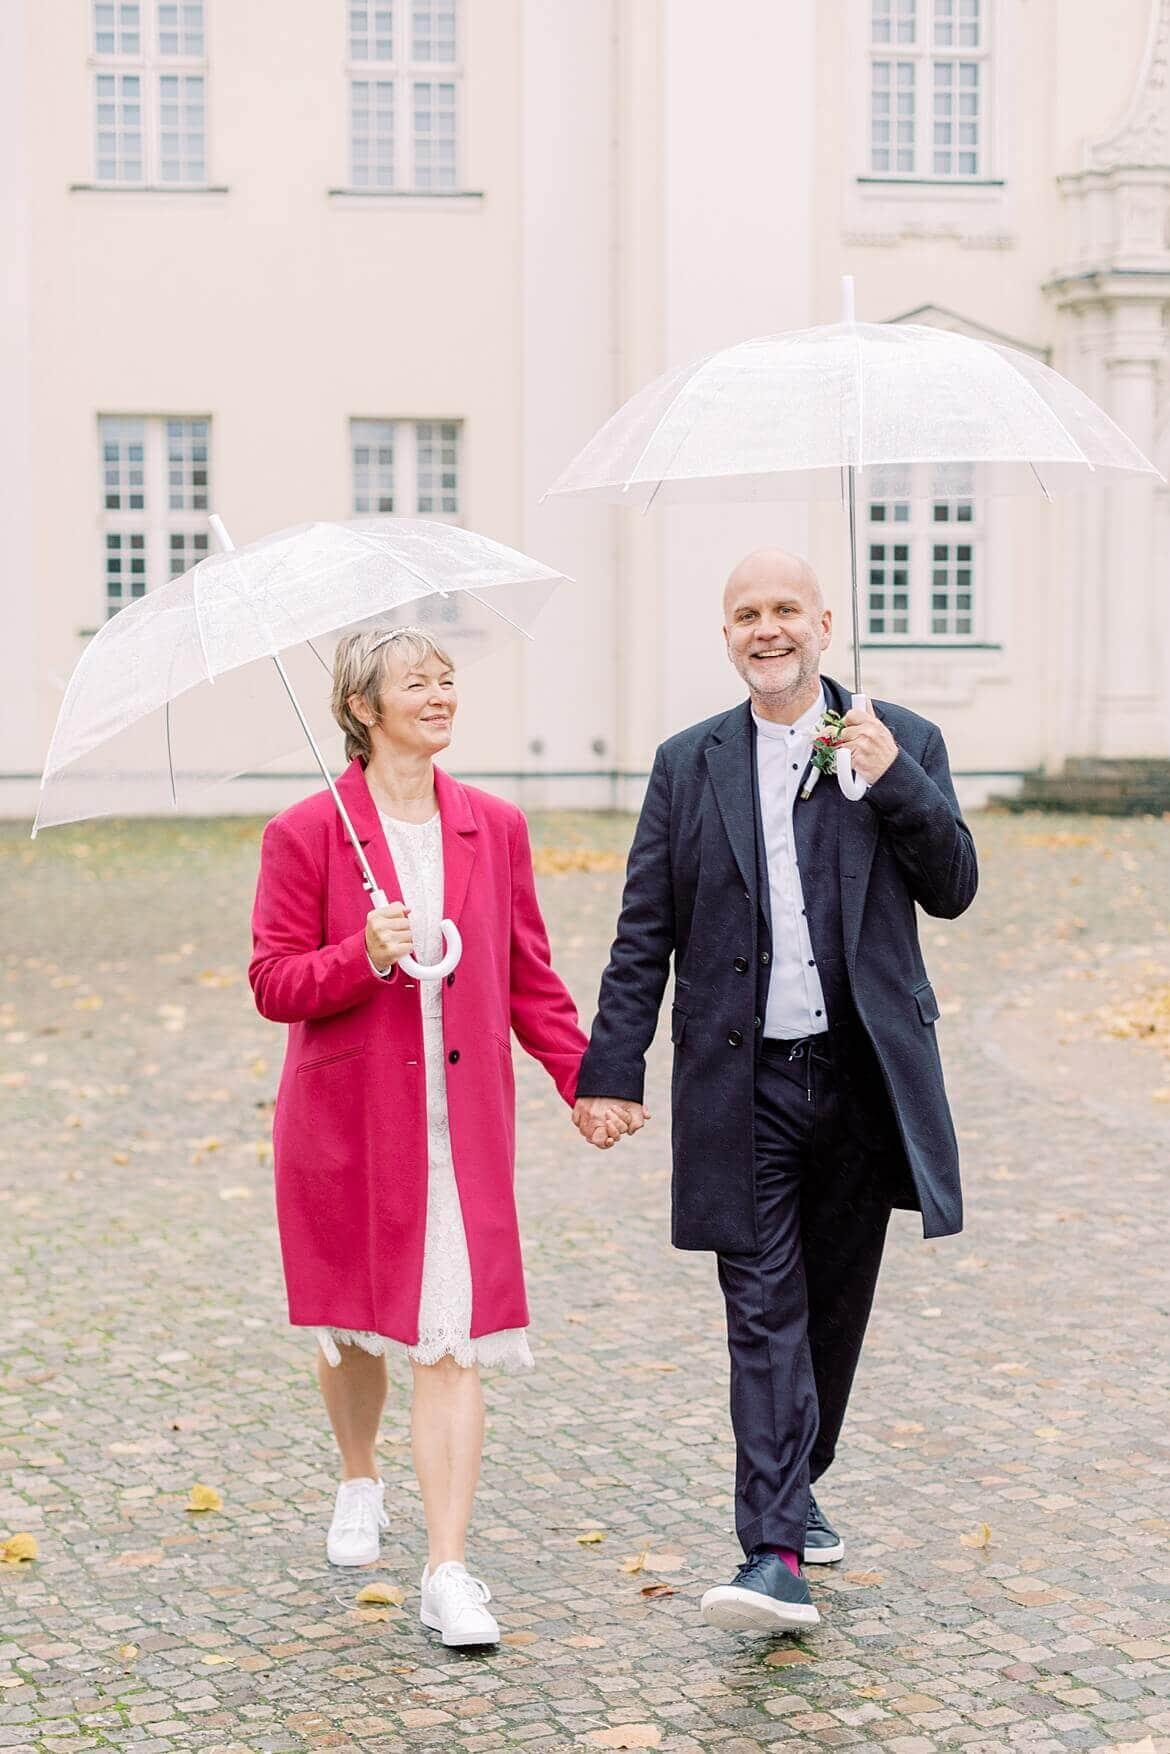 Brautpaar läuft unter Regenschirmen im Herbst vor dem Schloss Köpenick Berlin